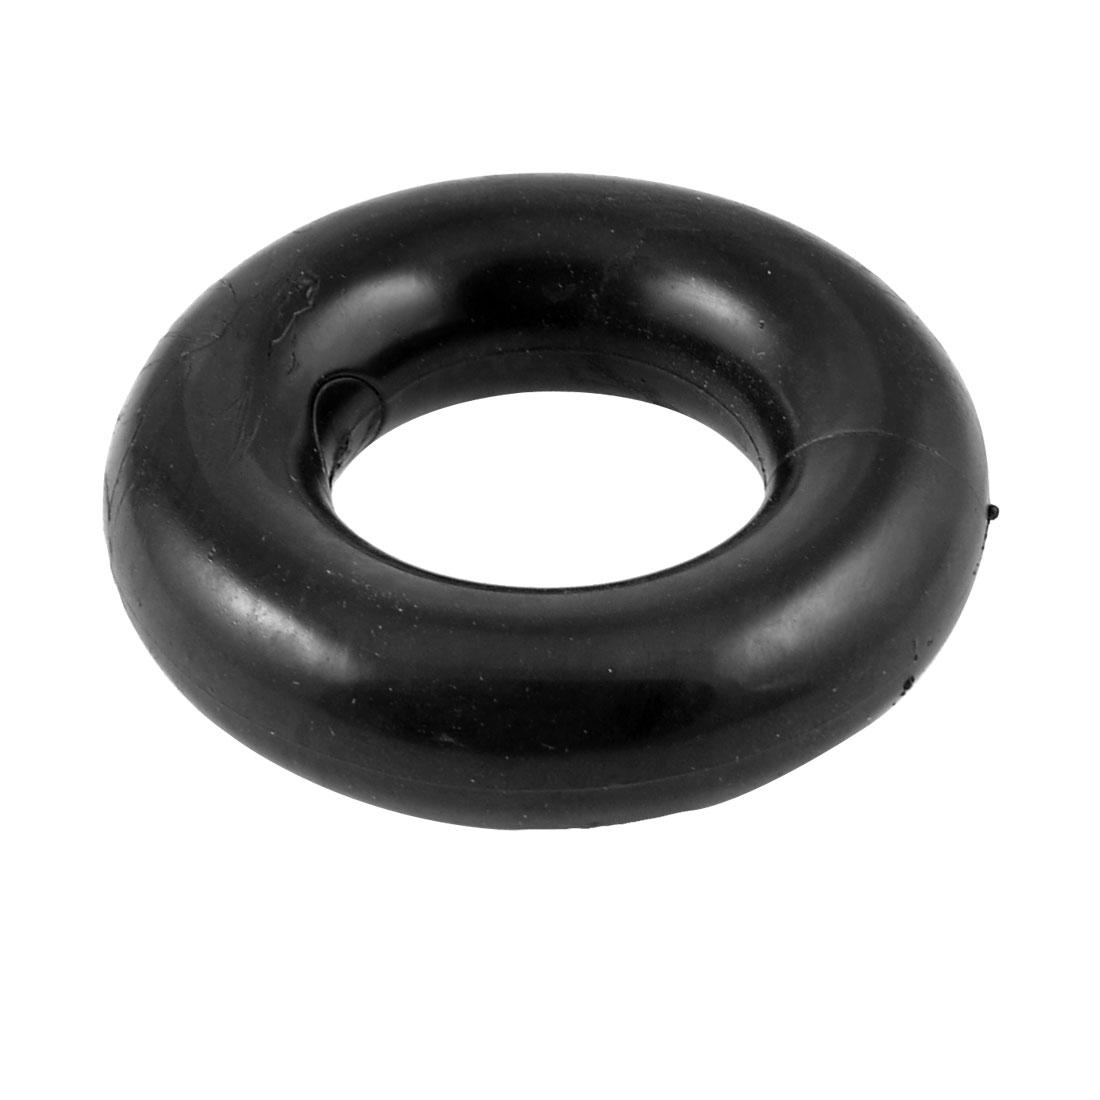 Elastic Soft Plastic Round Massage Finger Hand Ring Grip Black